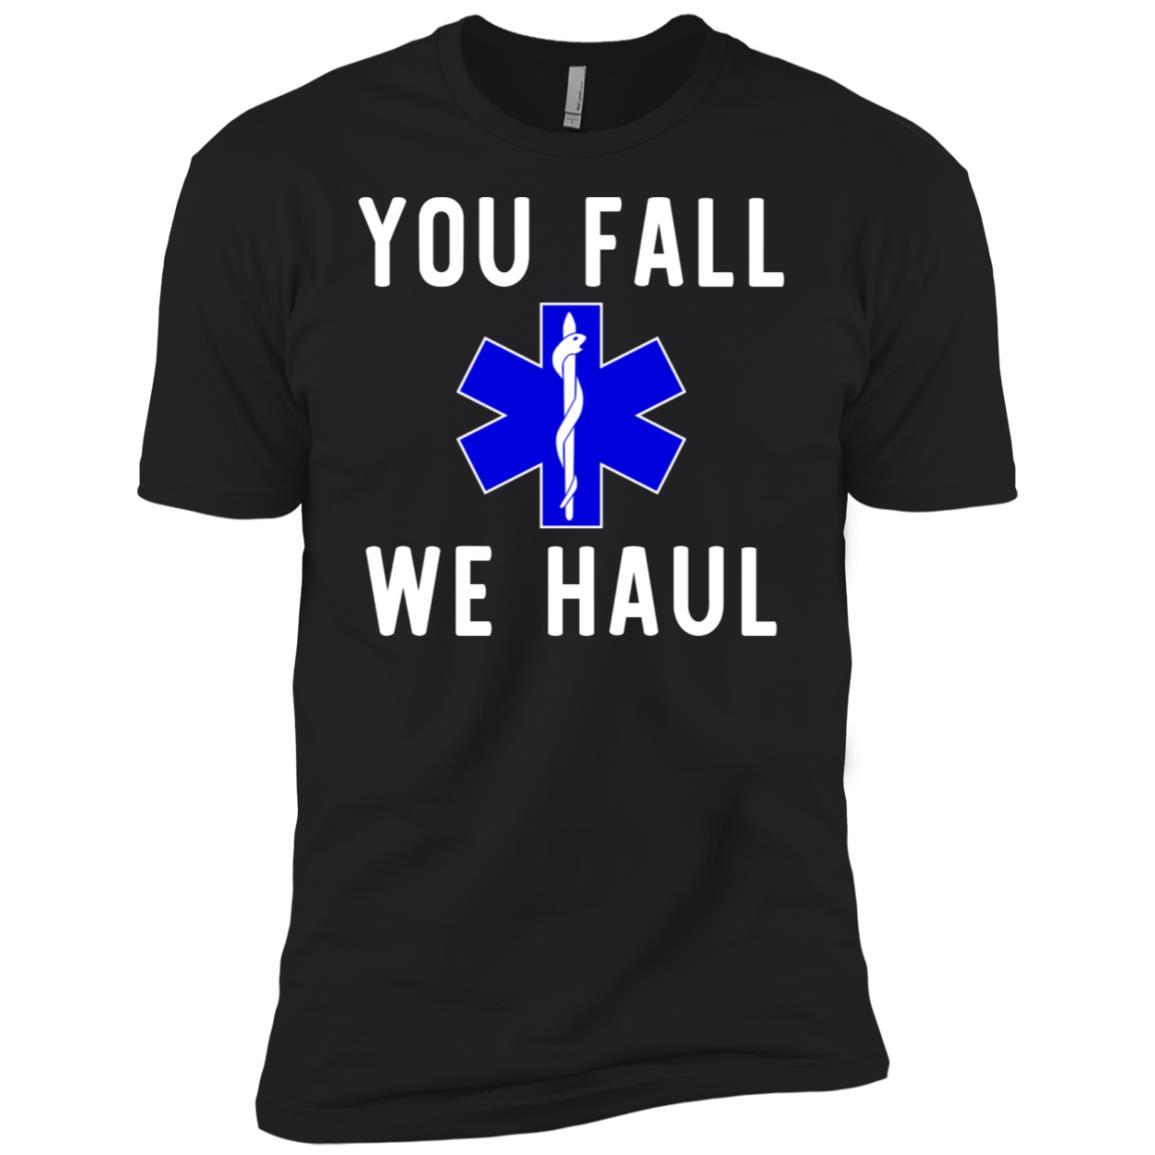 Funny You Fall We Haul Men Short Sleeve T-Shirt